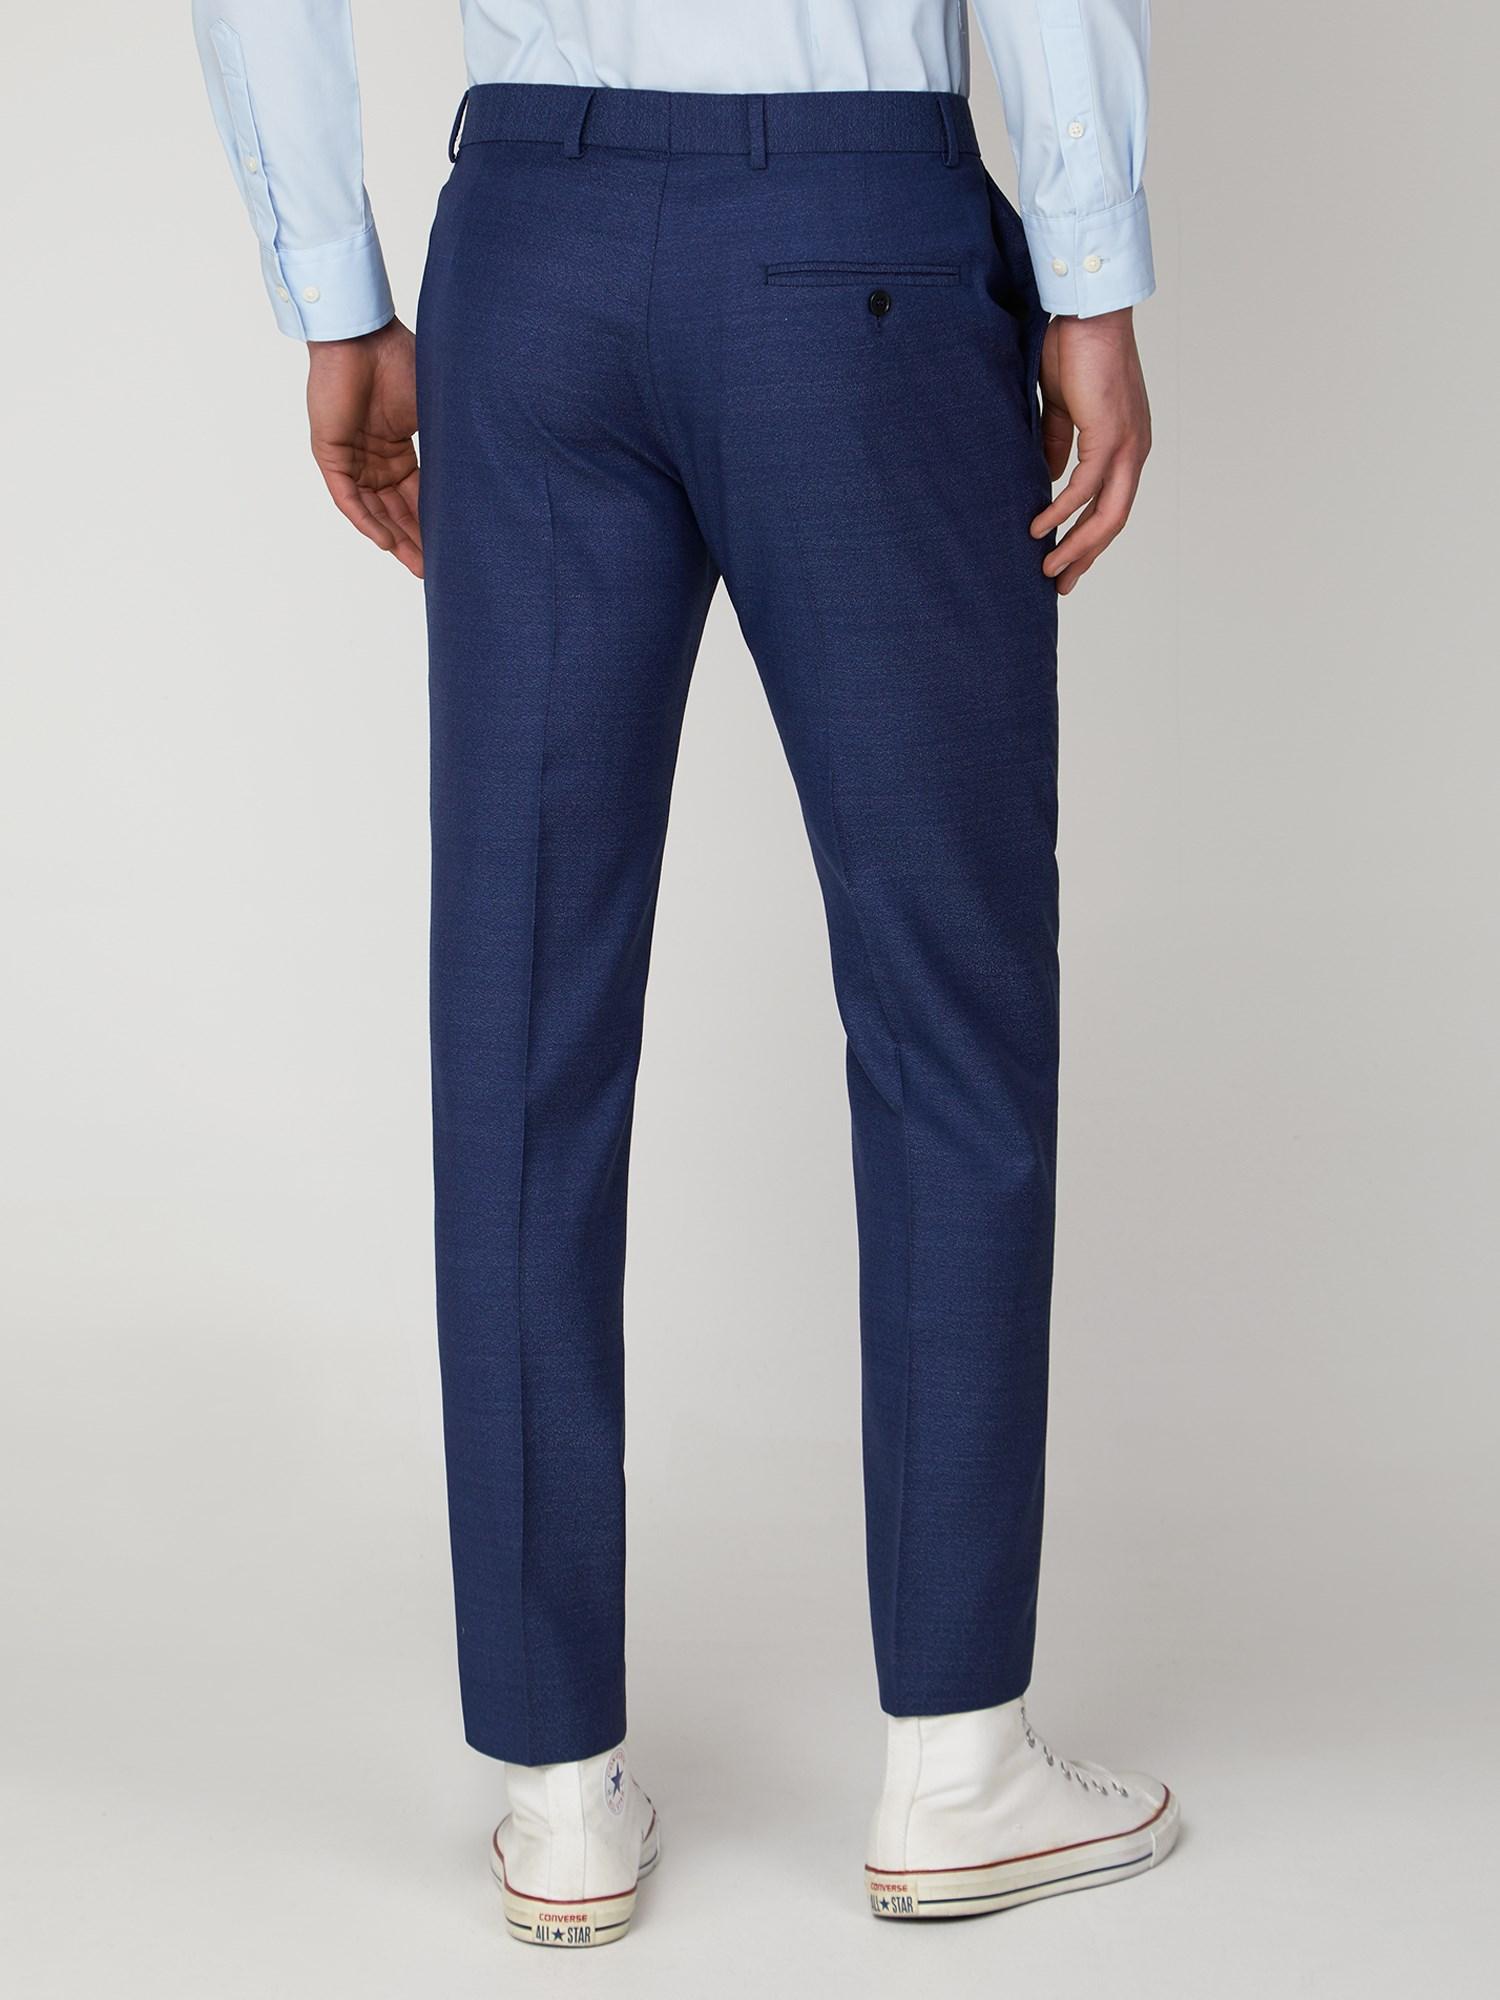 Blue Jaspe Slim Fit Suit Jacket